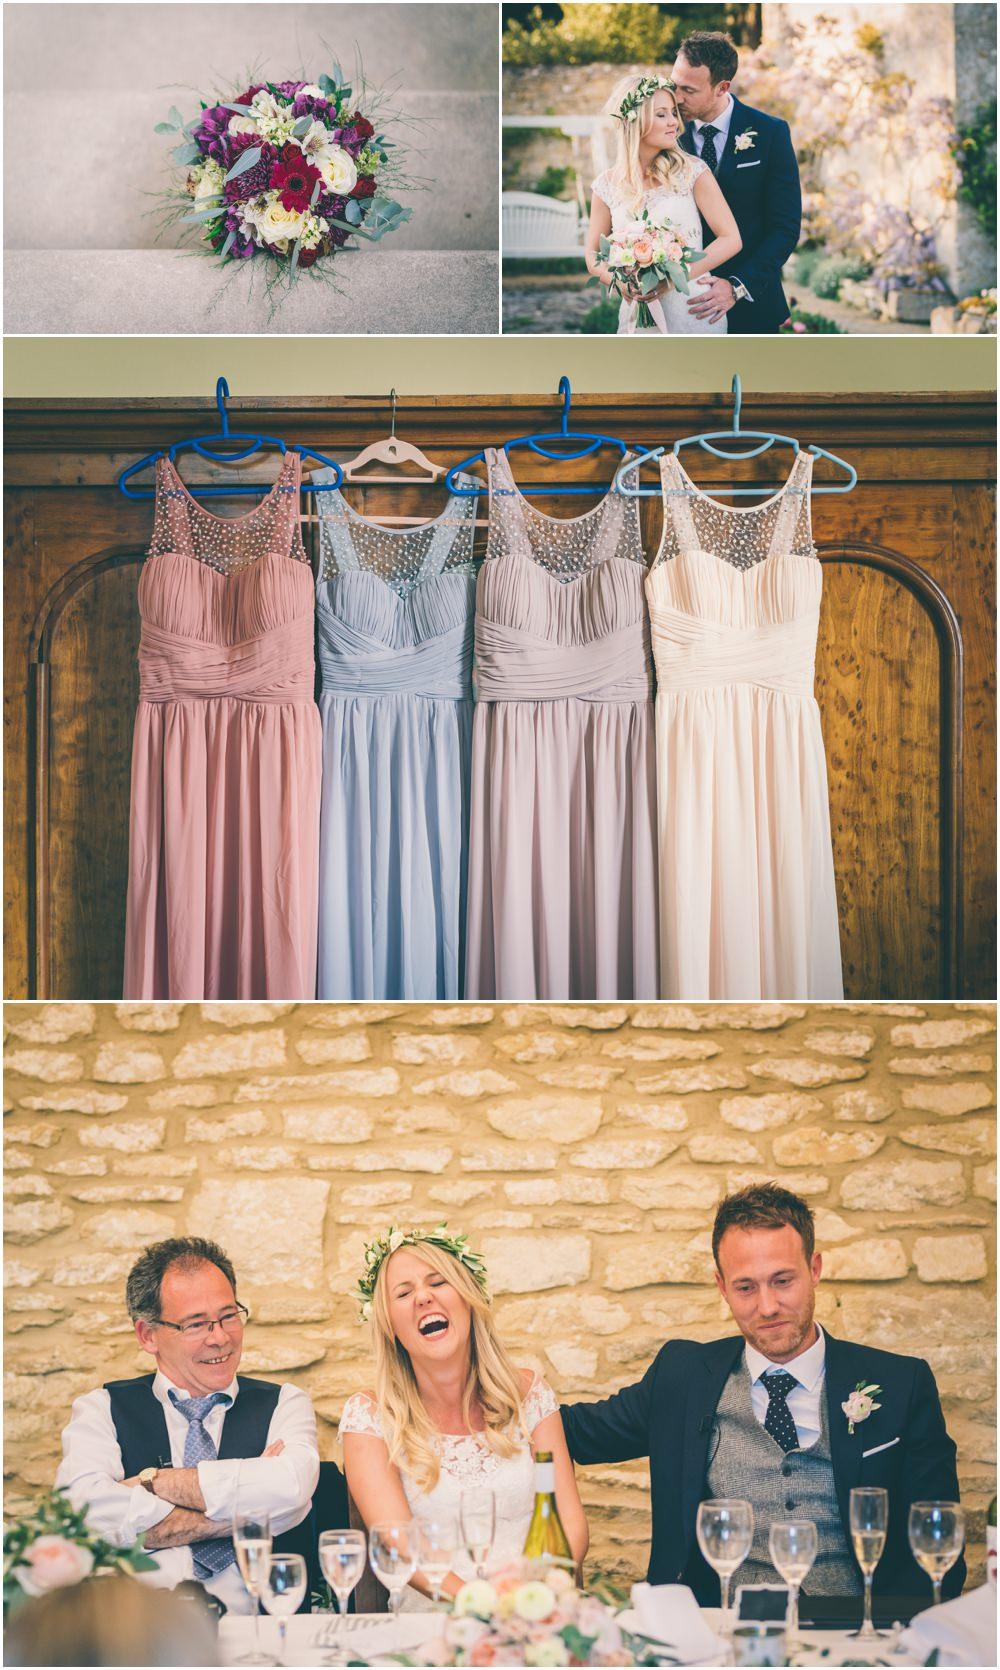 Rob Tarren UK Wedding Photography